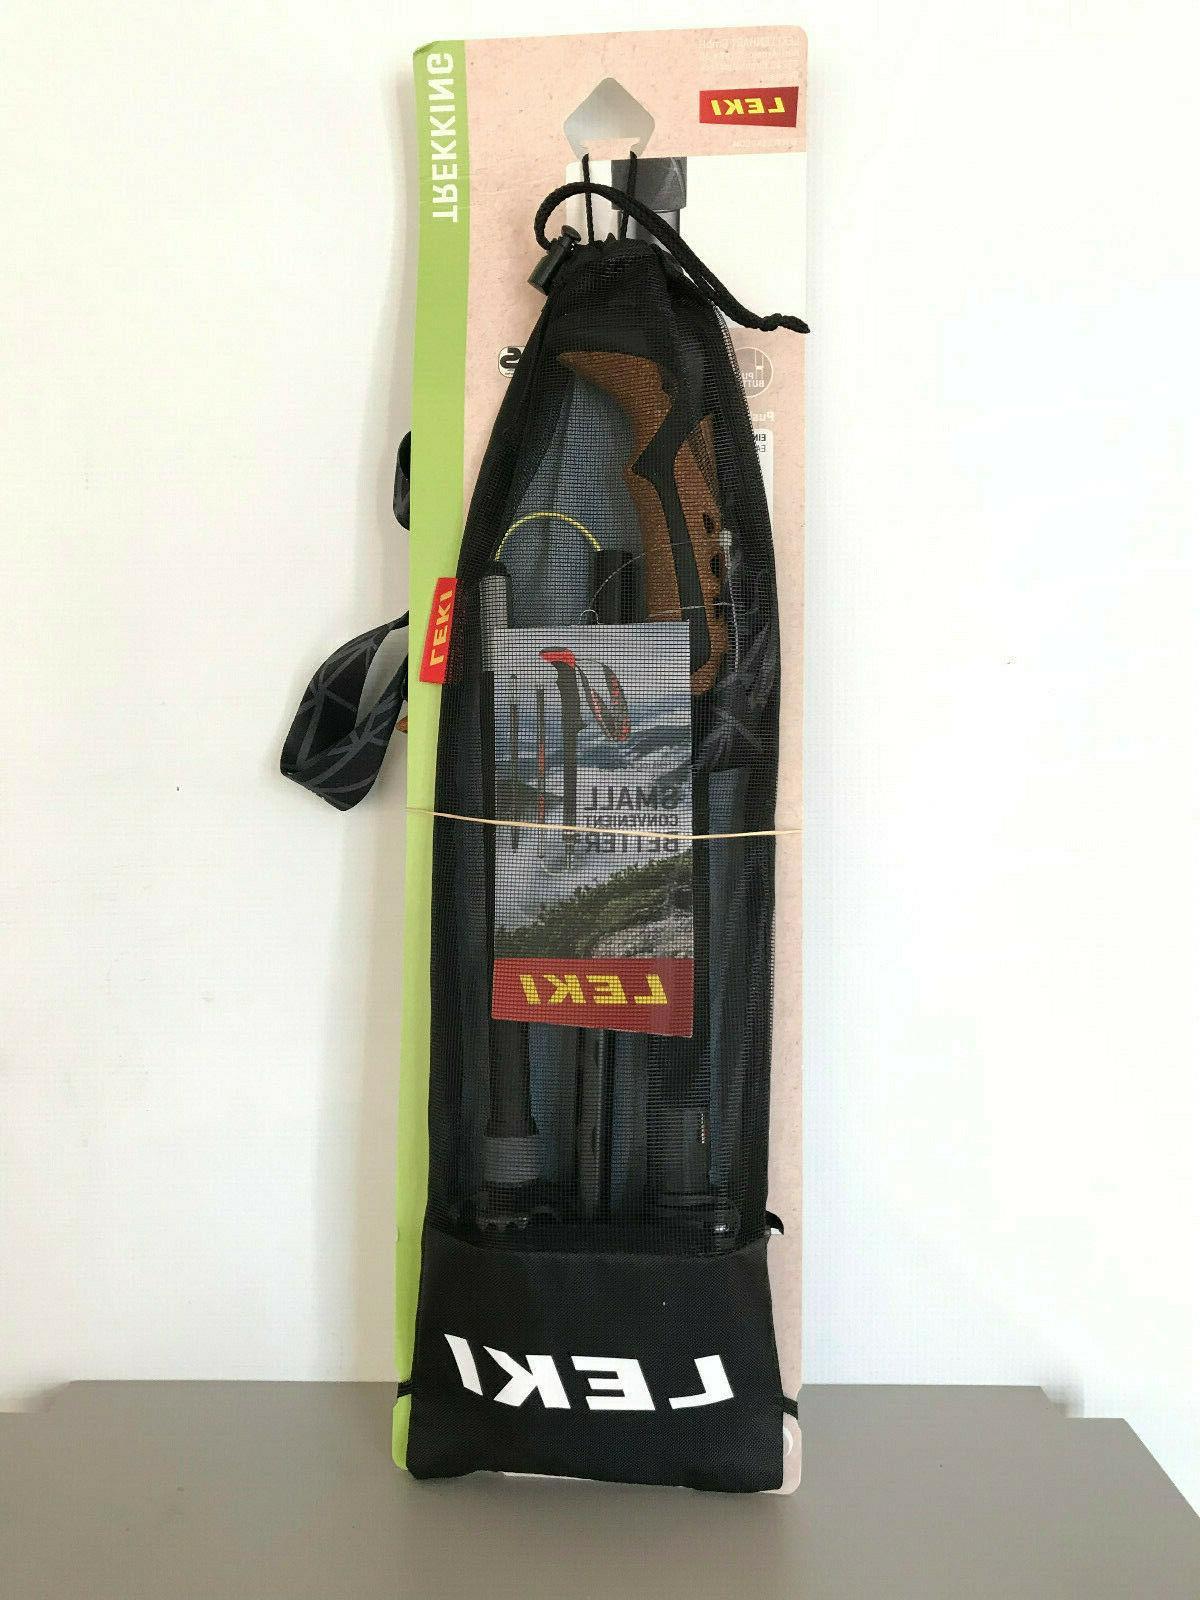 NEW 2019 Leki Vario TA Anti-Shock Trekking Poles